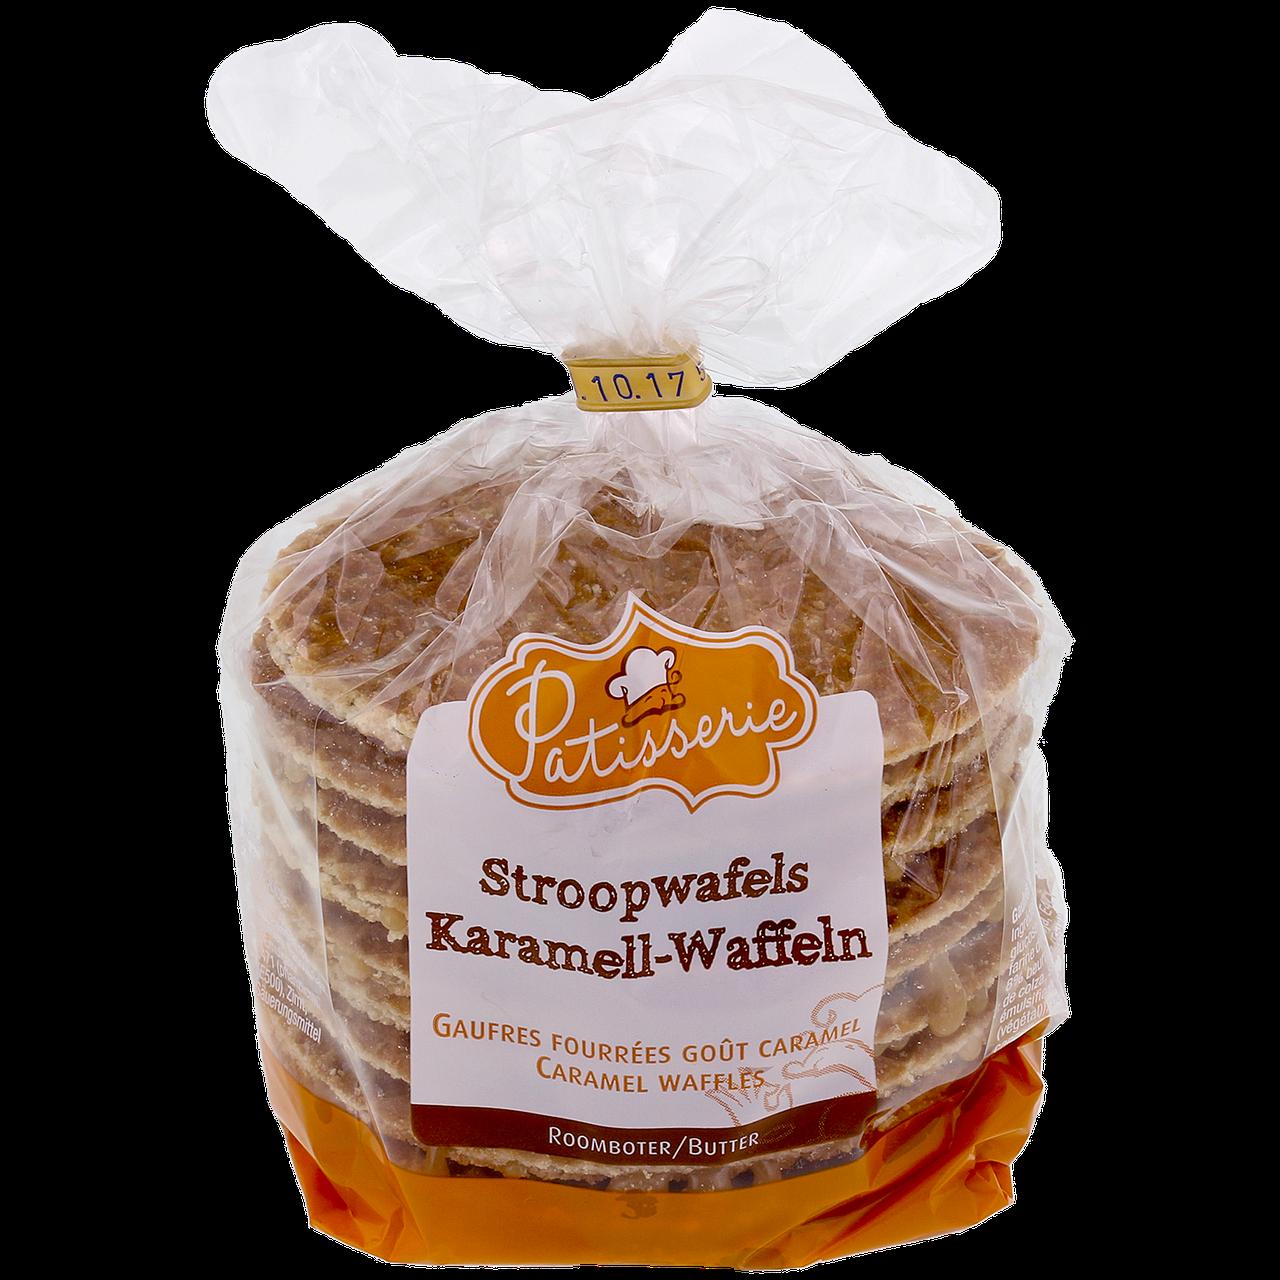 Вафли Стропвафли Stroopwafels Patisserie 400г с карамелью (Нидерланды)